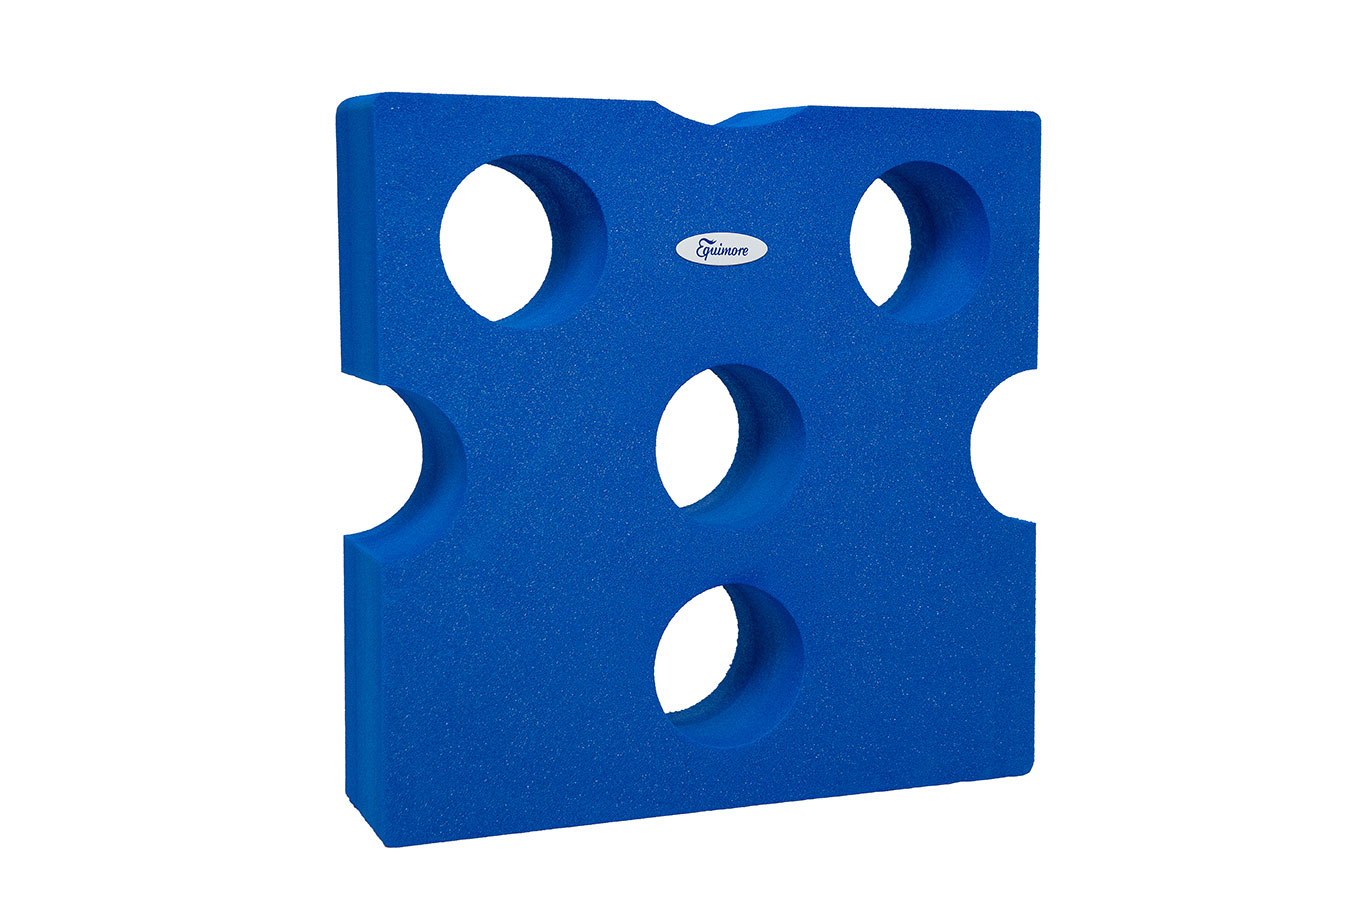 Equimore Cavaletti XL blau